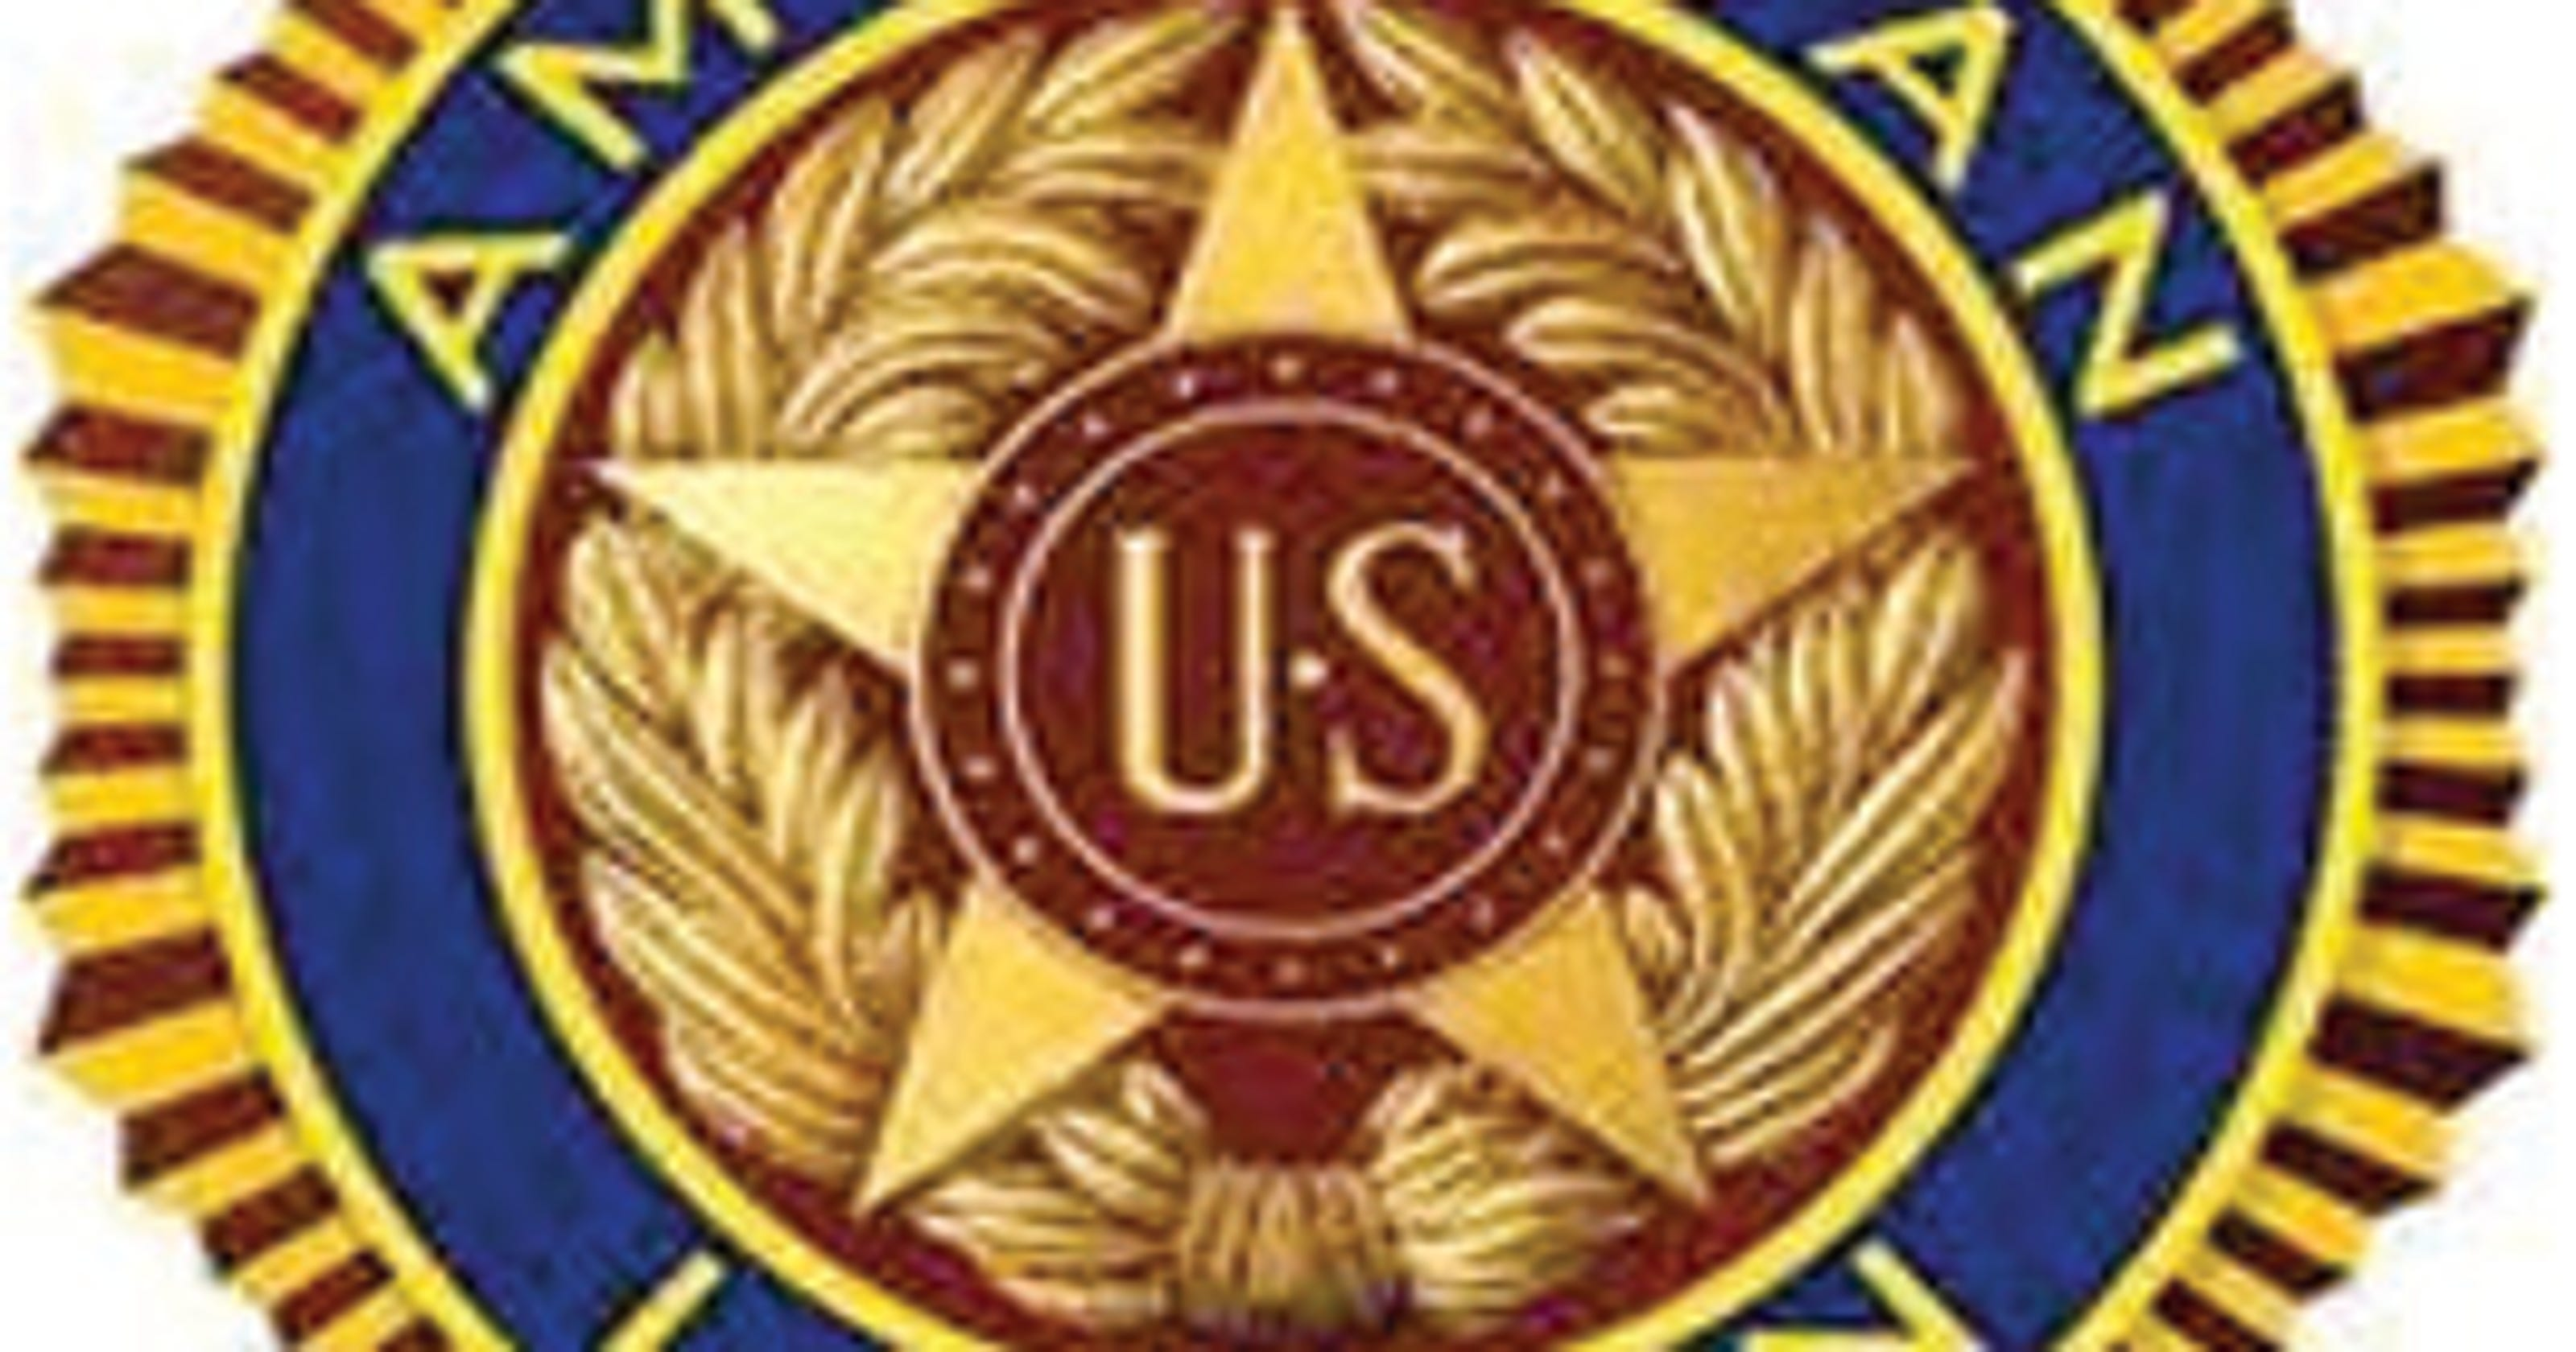 American Legion Making Comeback In Fairview